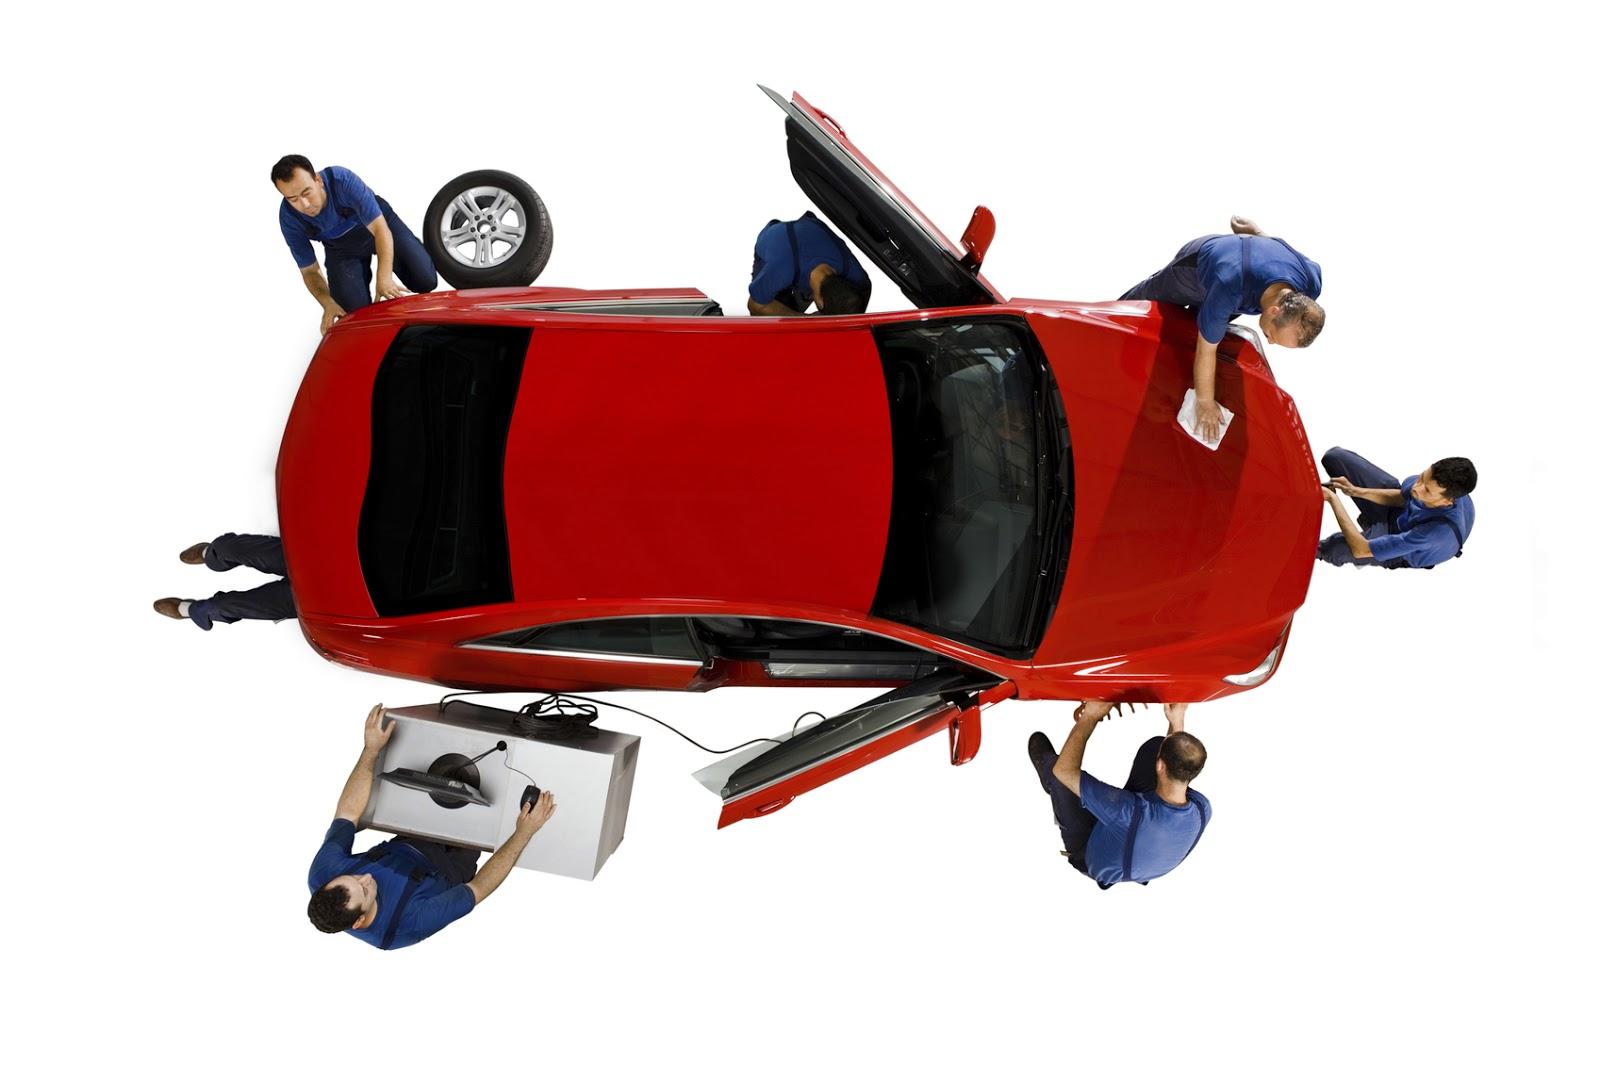 Работа и учет заказ-нарядов автосервиса